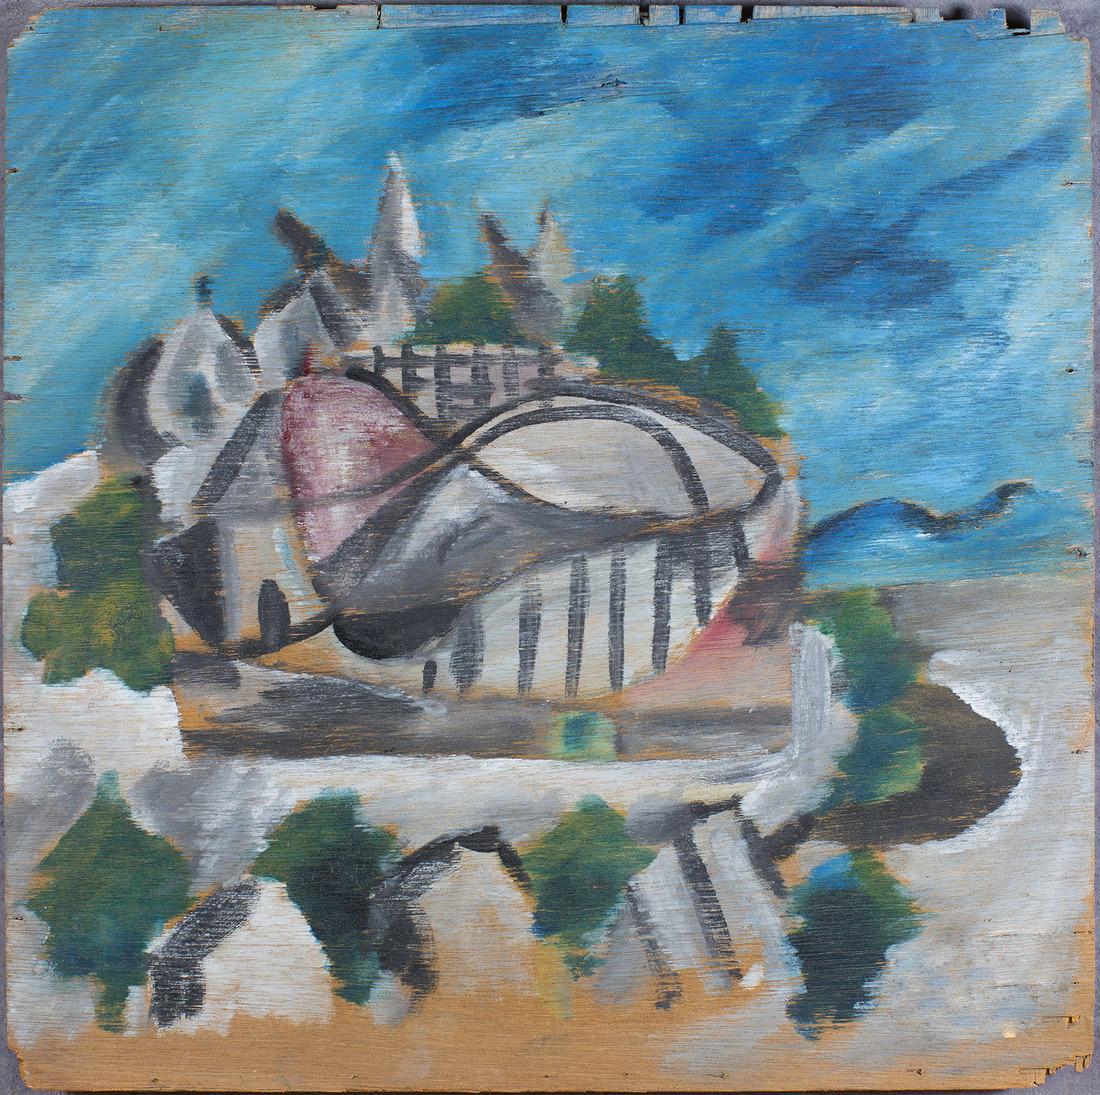 Sir Sidney Robert NOLAN (b.1917; d.1992) - THE BIG DIPPER - LUNA PARK - St Kilda